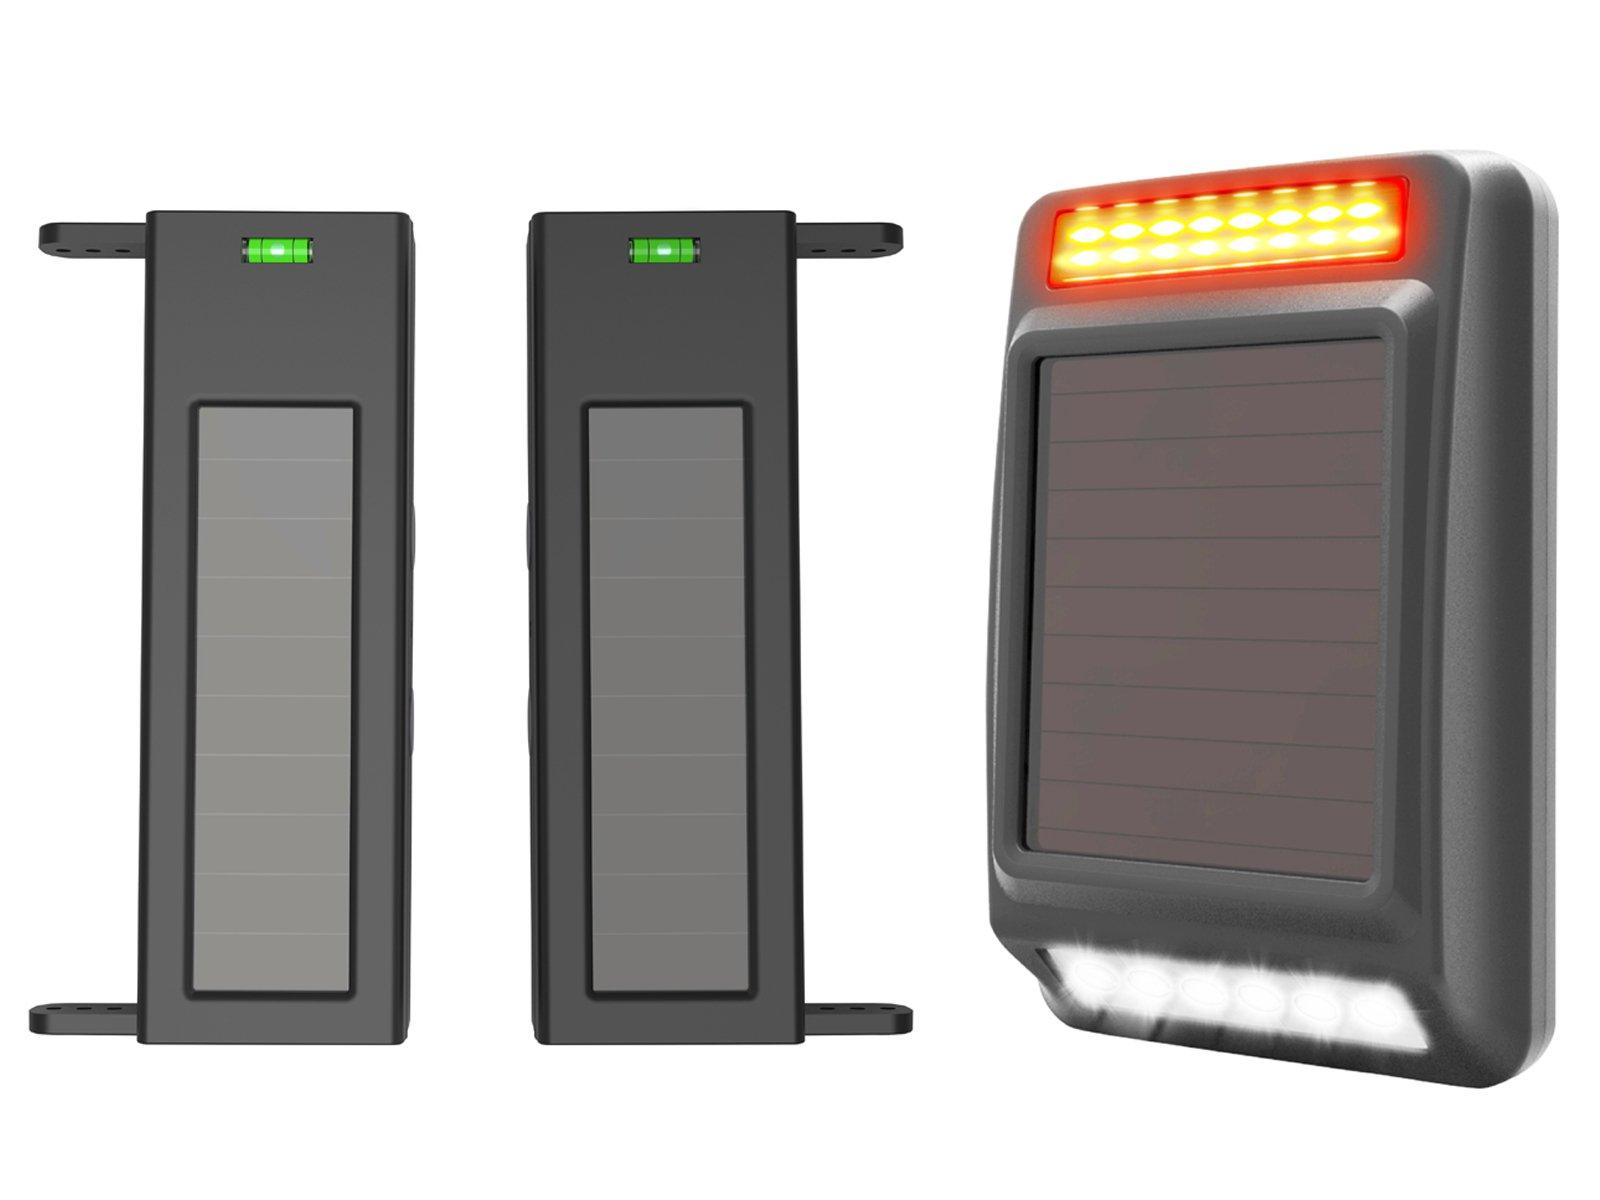 Outdoor Weatherproof DIY Security Perimeter Alert System 1//4 Mile Long Transmission Range 190 Feet Wide Sensor Range No Wiring No Need Replace Battery HTZSAFE Solar Wireless Driveway Alarm System